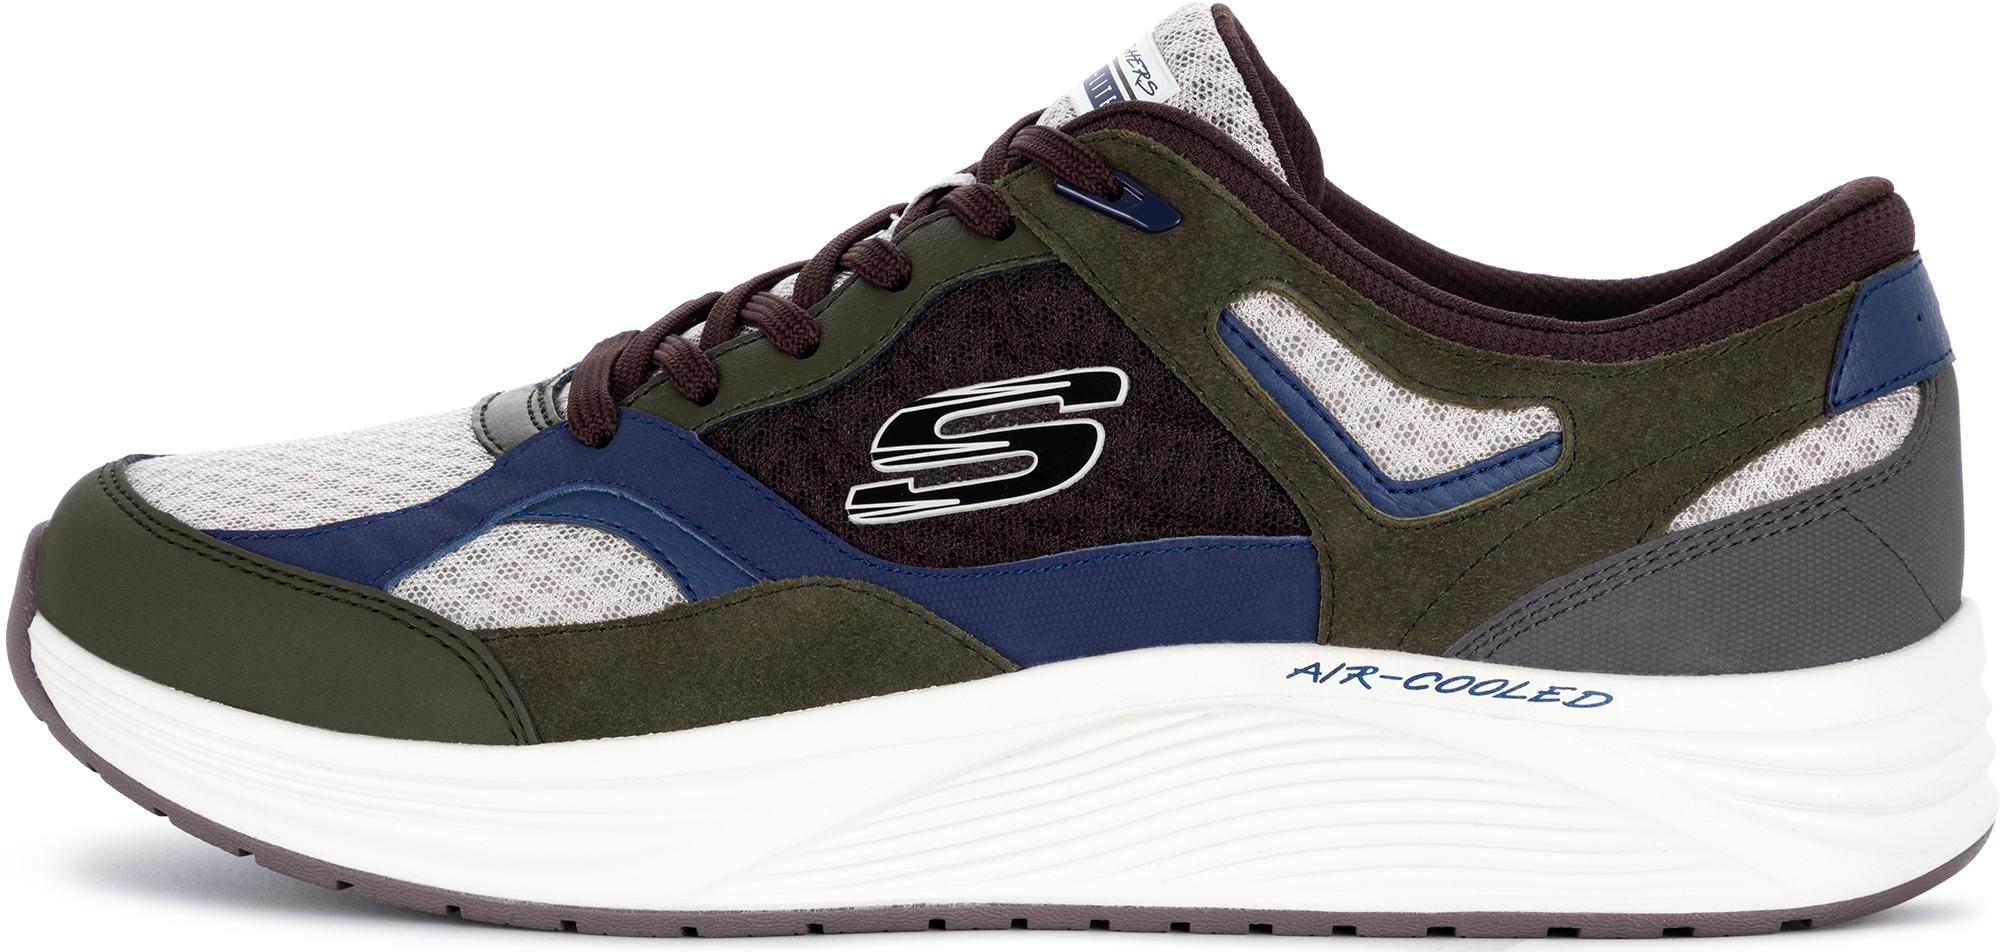 Skechers Кроссовки мужские Skyline-Alphaborne, размер 40,5